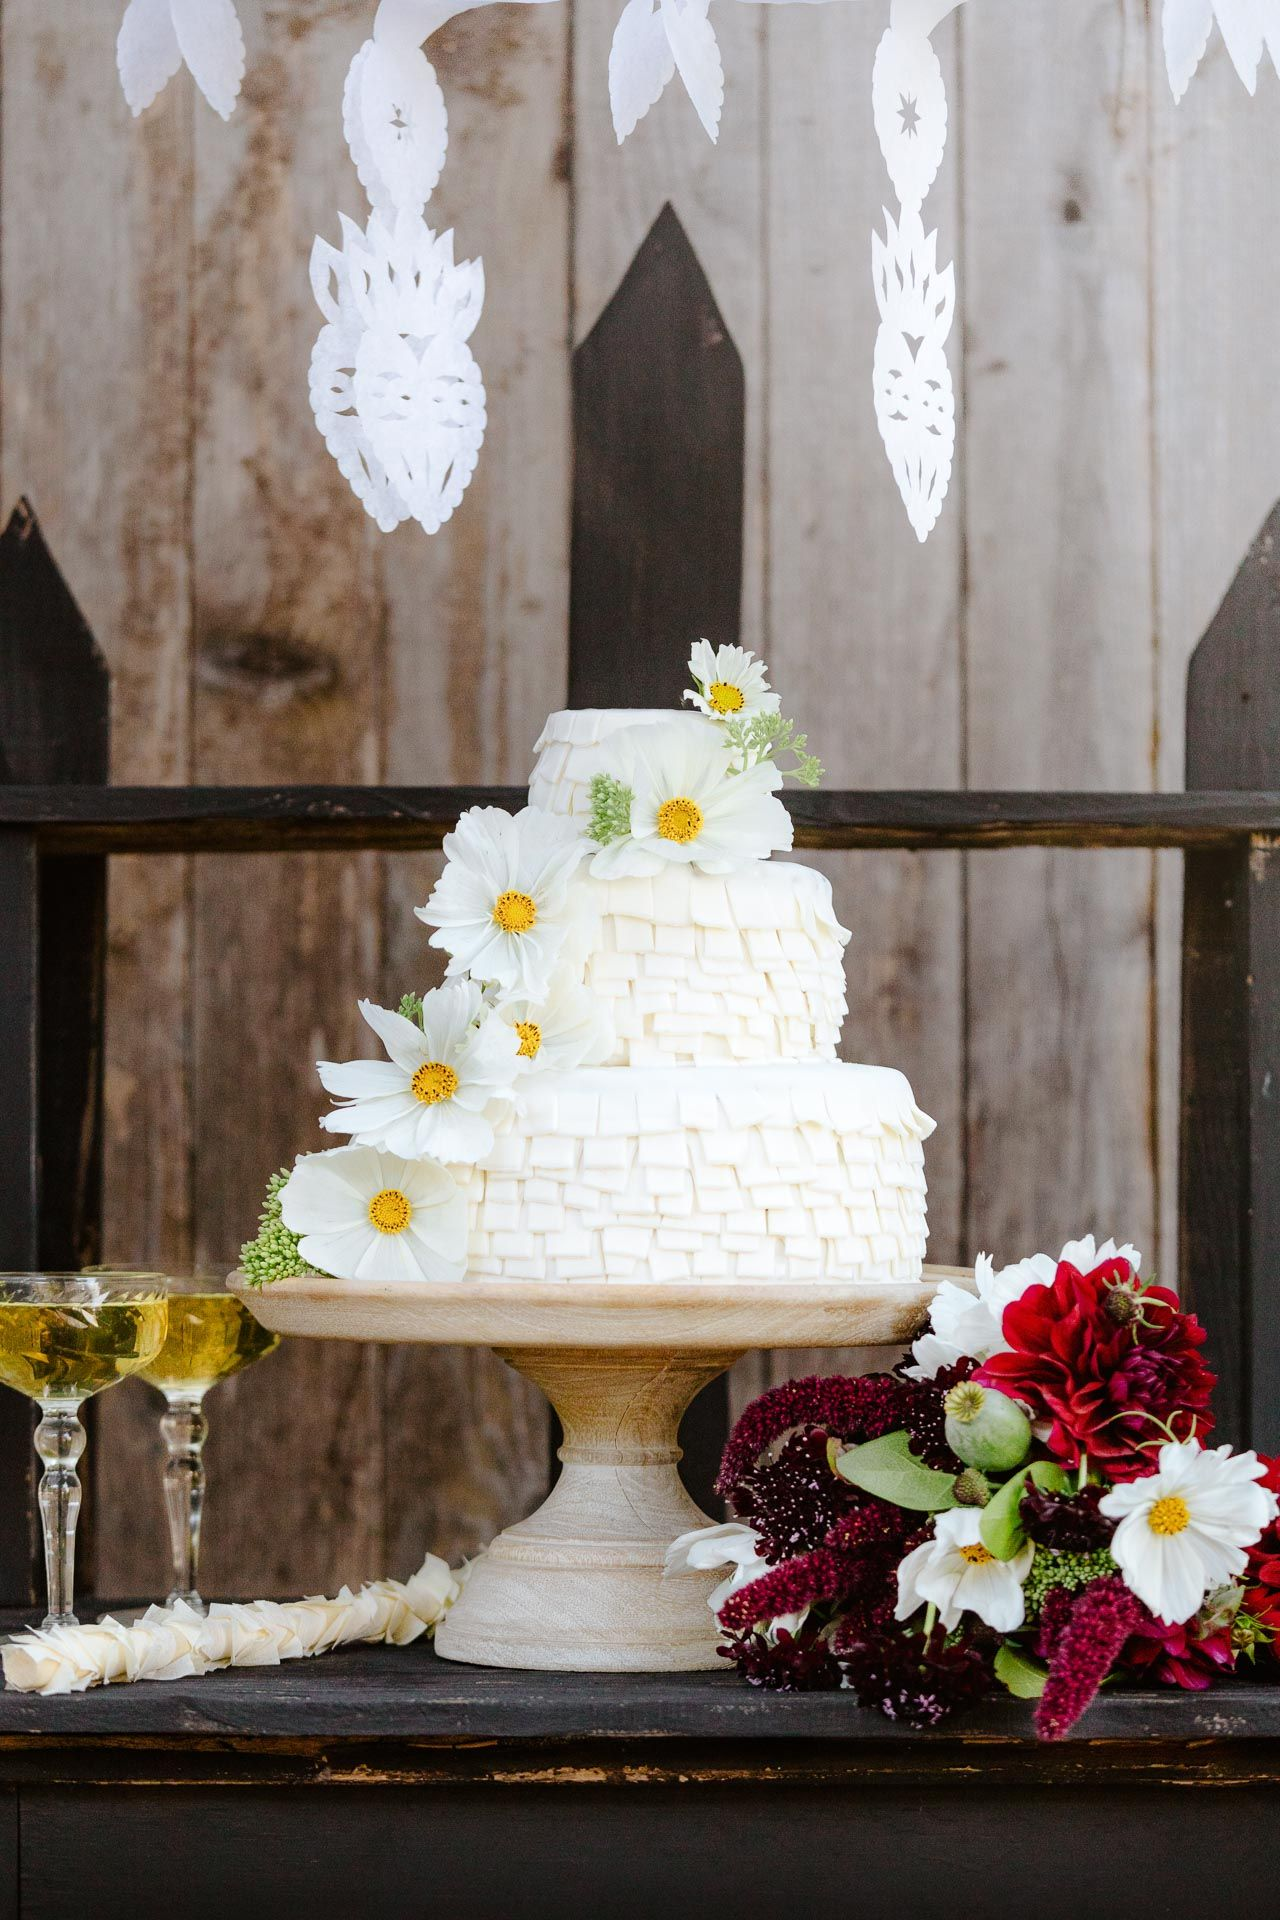 Piñata Wedding Cake Recipe Cake, Chocolate pinata